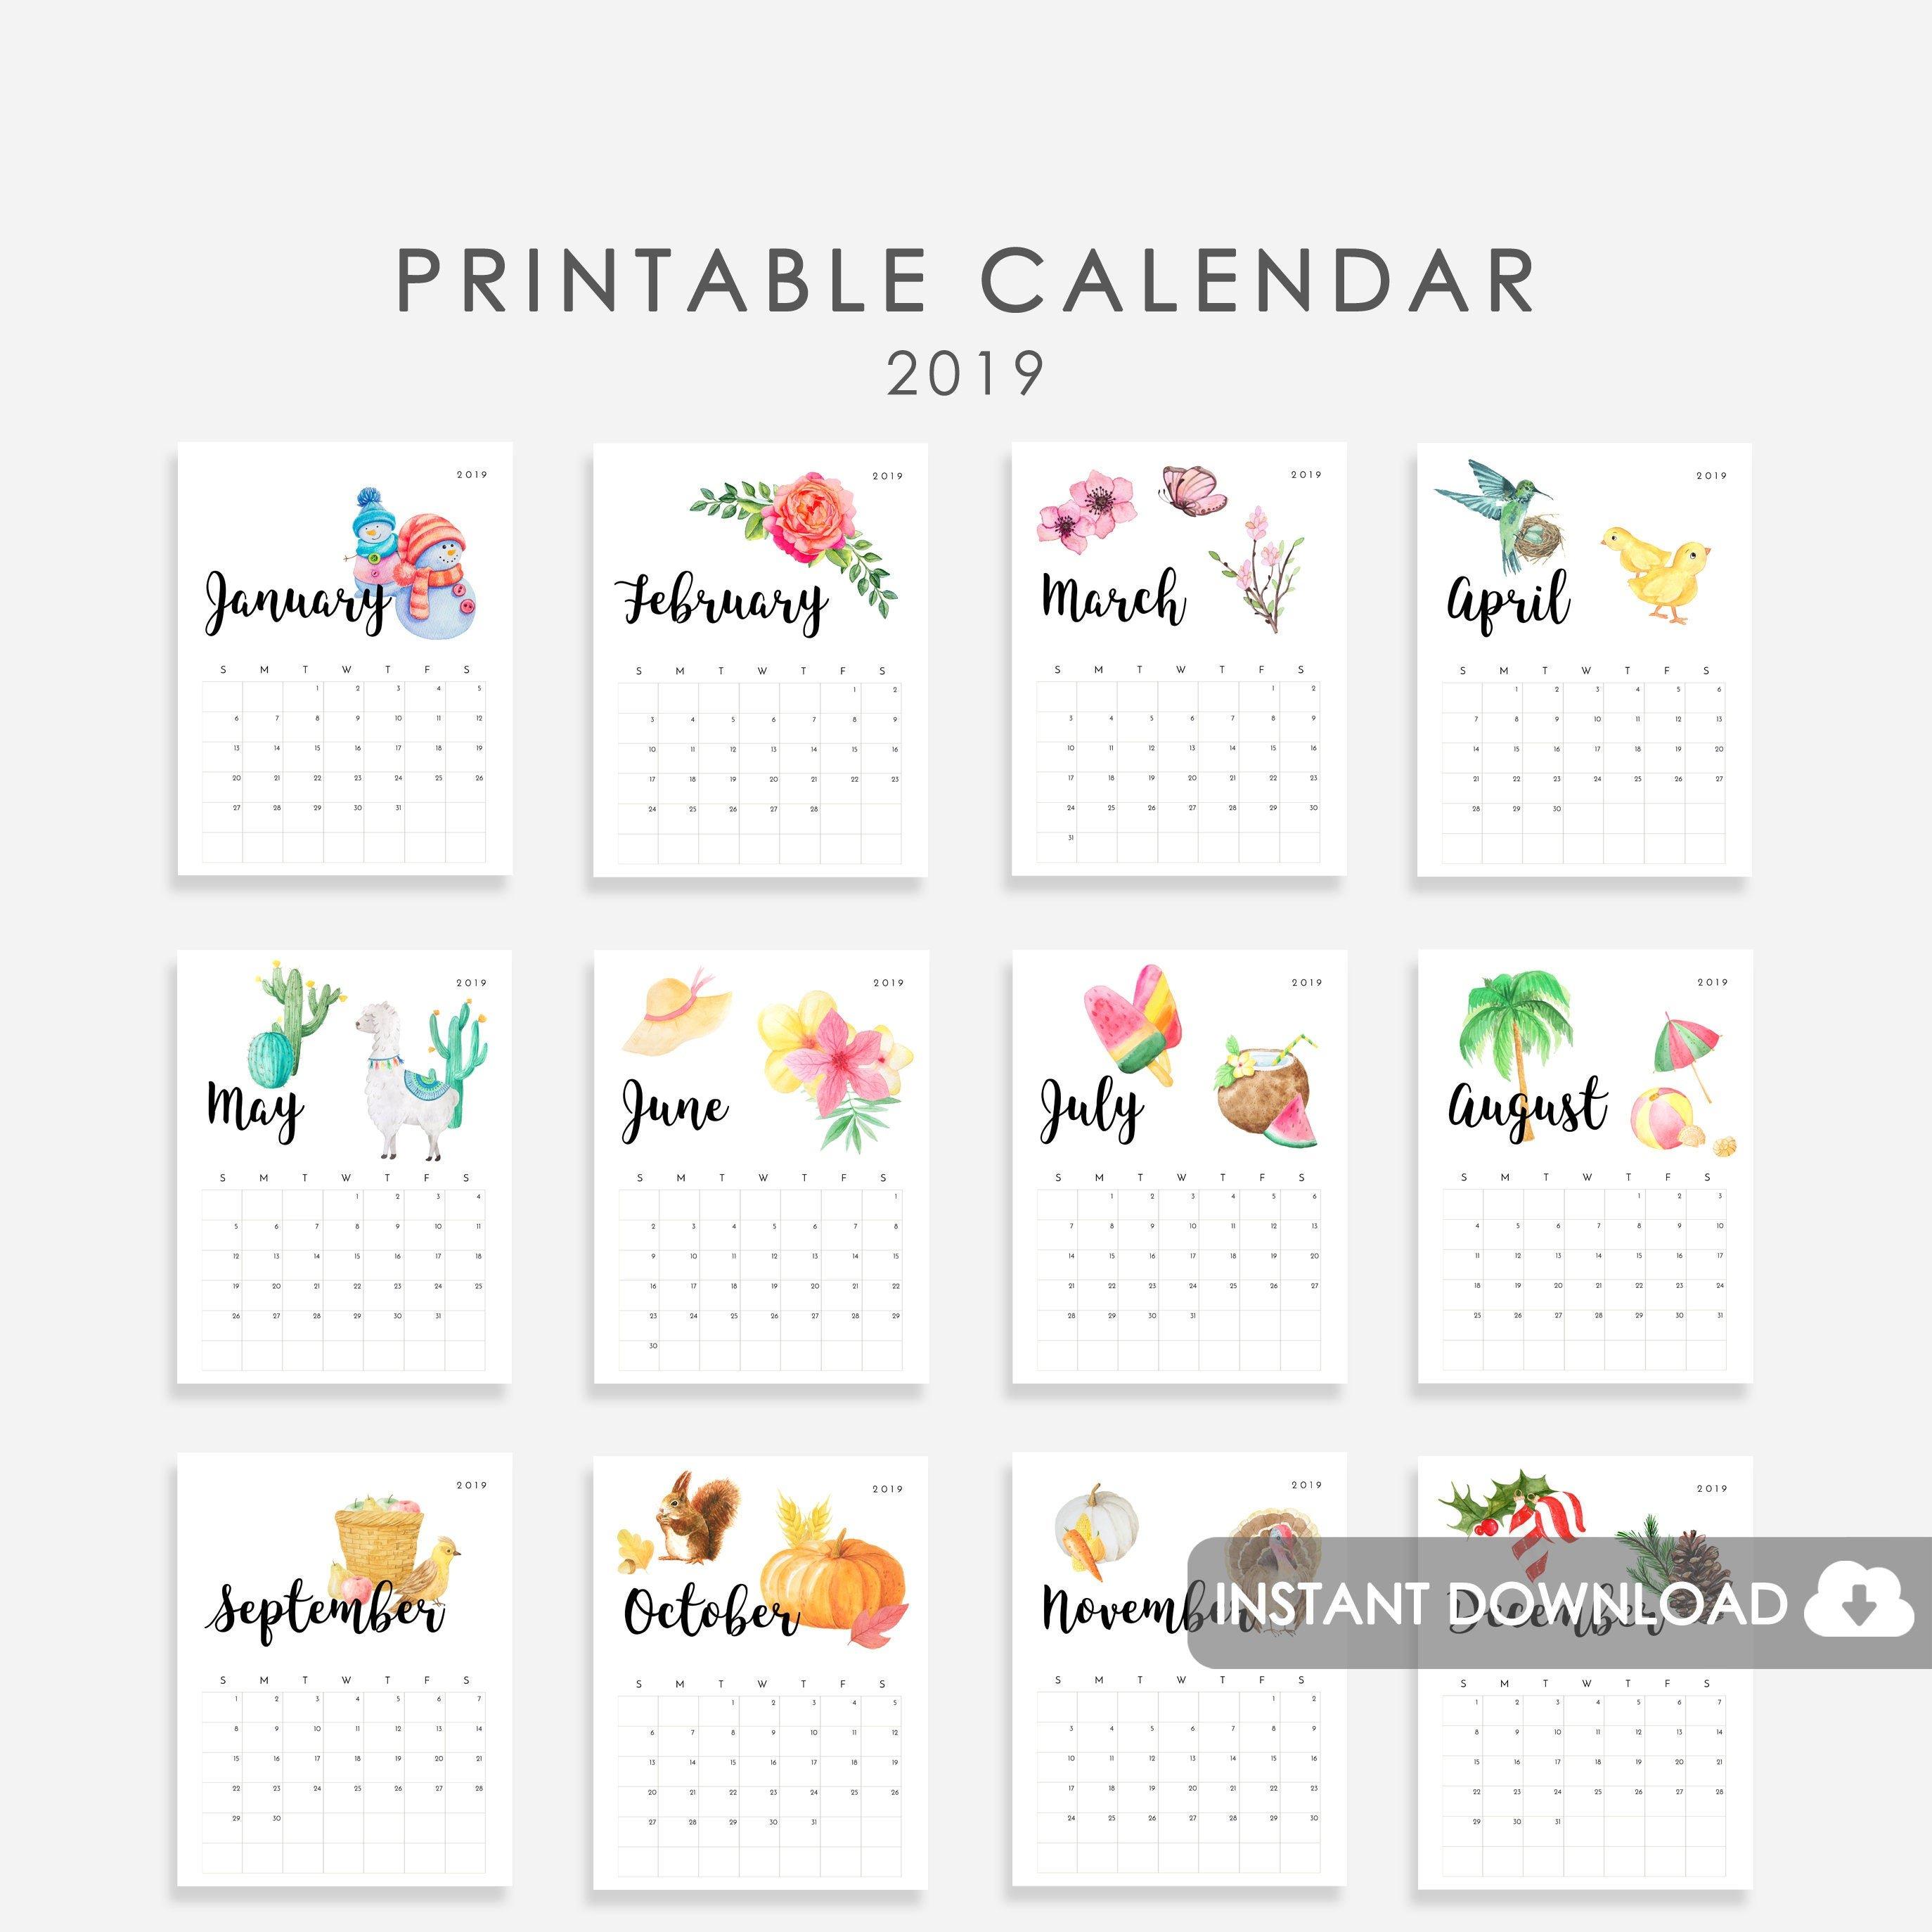 Seasonal Calendar 2019 Printable Watercolor Illustrations | Etsy 4 Seasons Calendar 2019